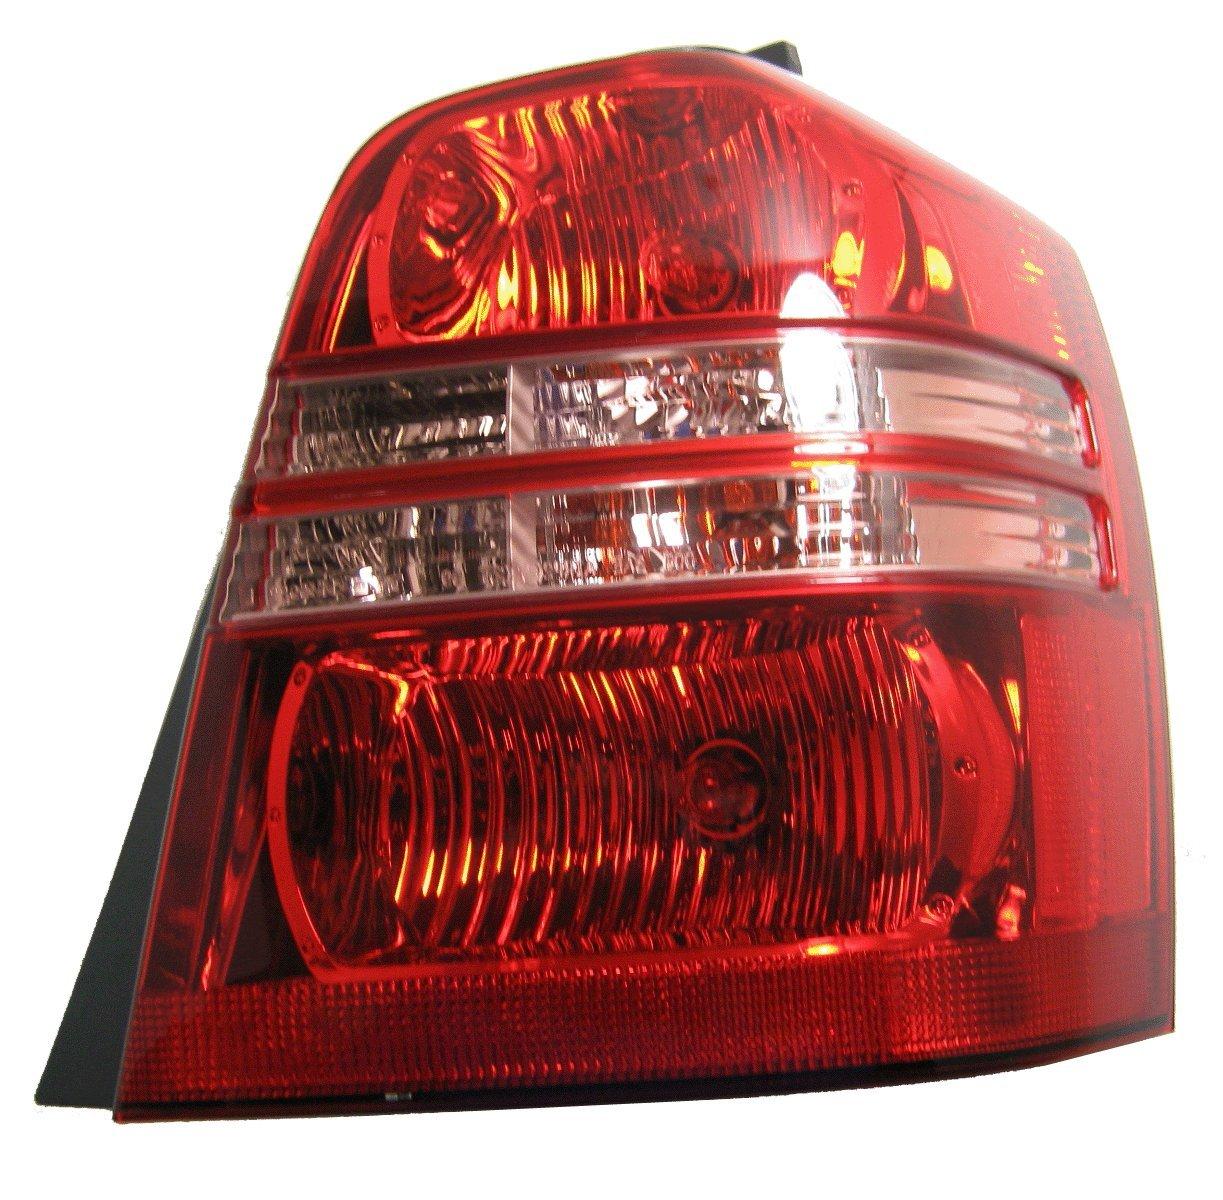 Amazon.com: TOYOTA VAN HIGHLANDER TAIL LIGHT RIGHT (PASSENGER SIDE)  2001-2003: Automotive